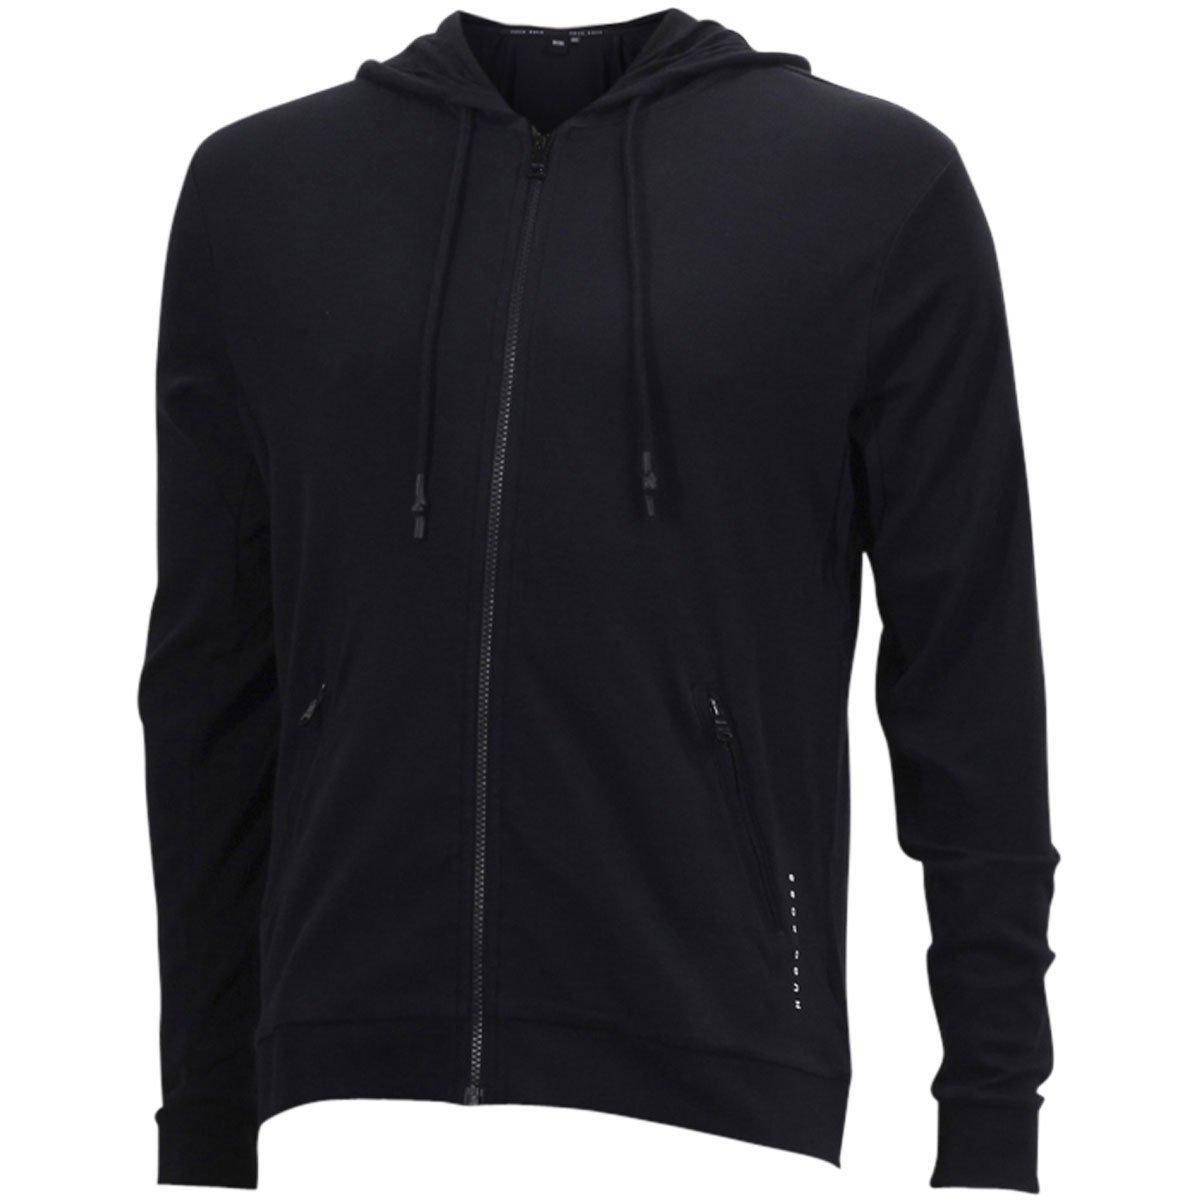 Hugo Boss Black Interlock Cotton Zip-Through Hooded Sweatshirt Jacket Sz: XL